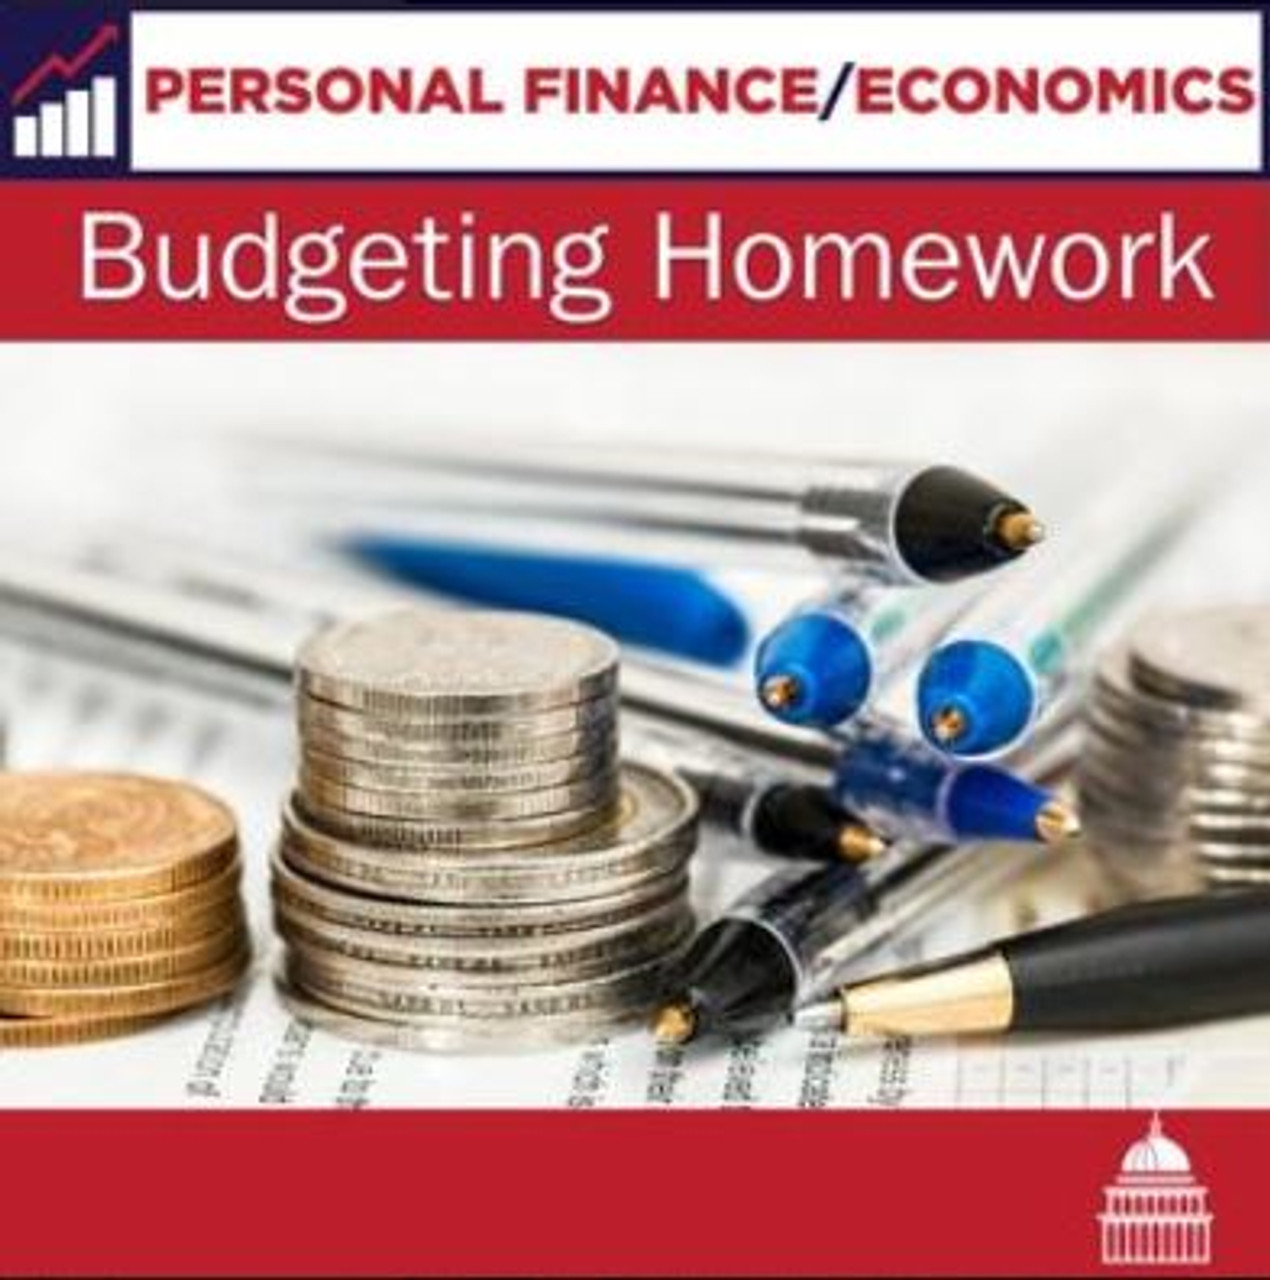 Budgeting Homework